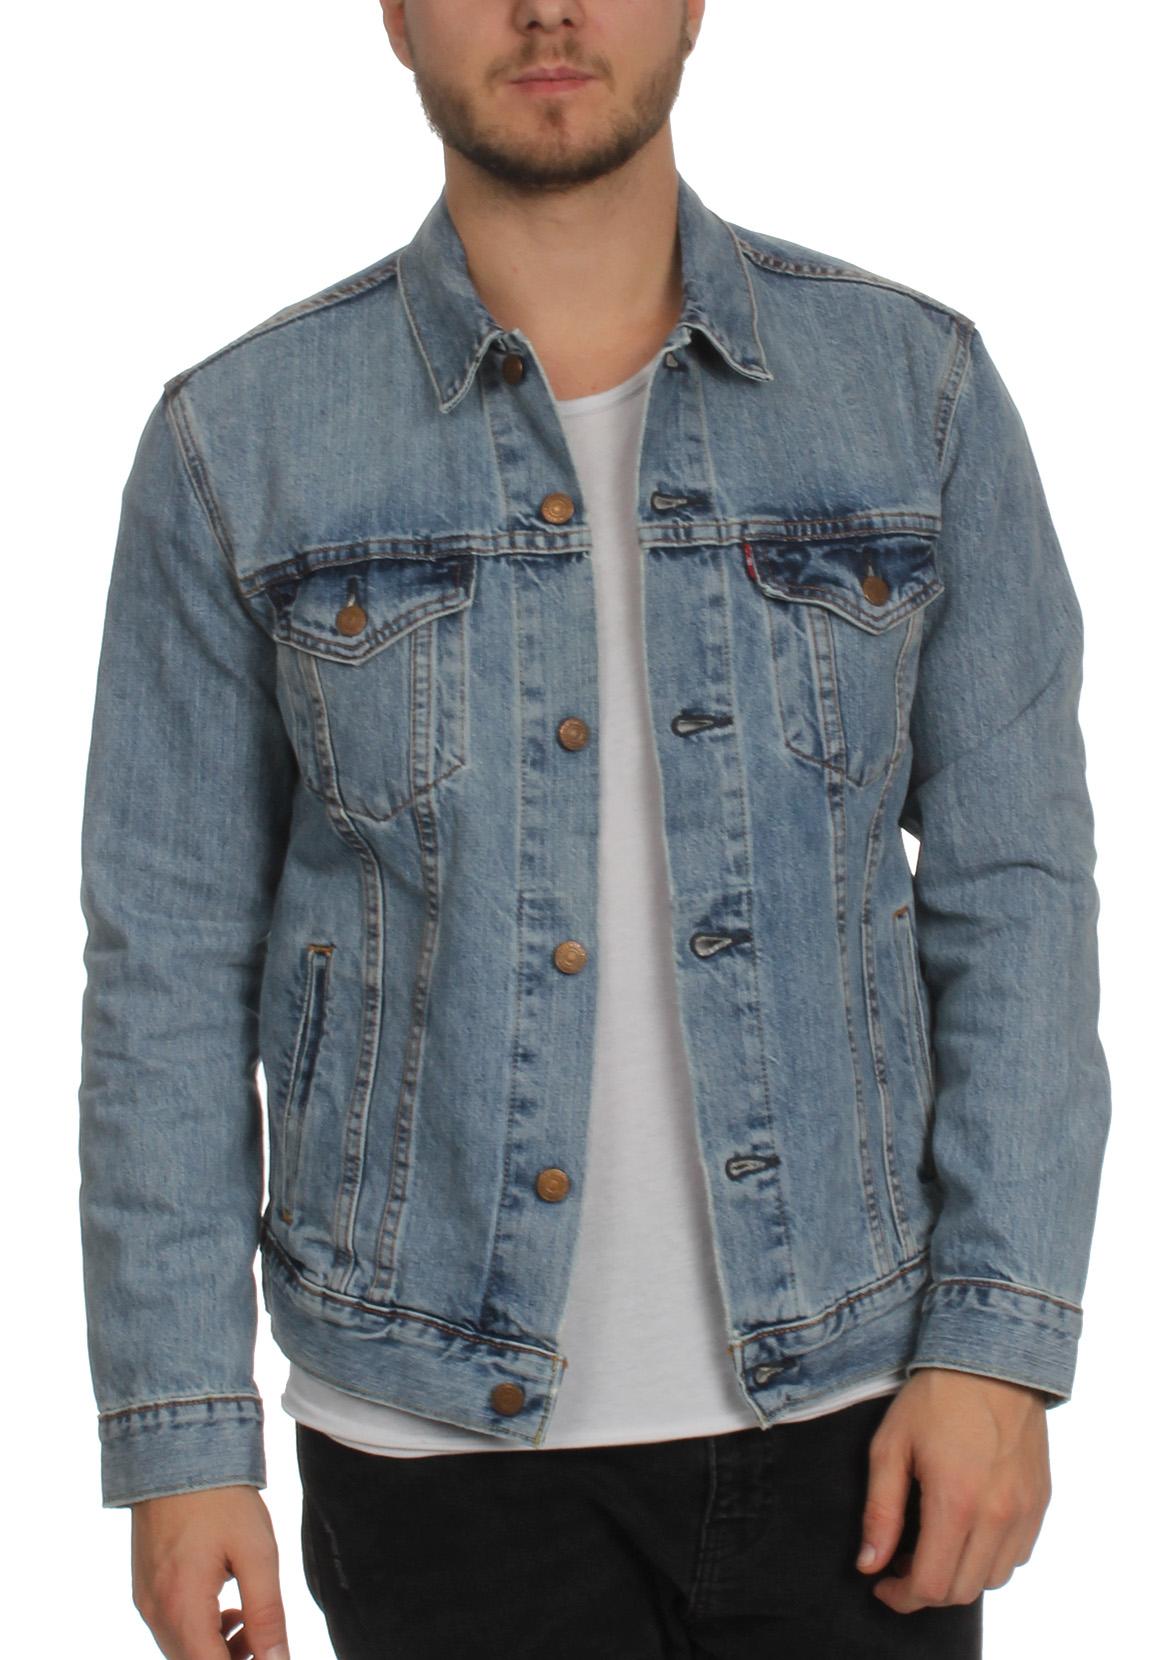 levis herren jeansjacke the trucker jacket 72334 0146 icy. Black Bedroom Furniture Sets. Home Design Ideas